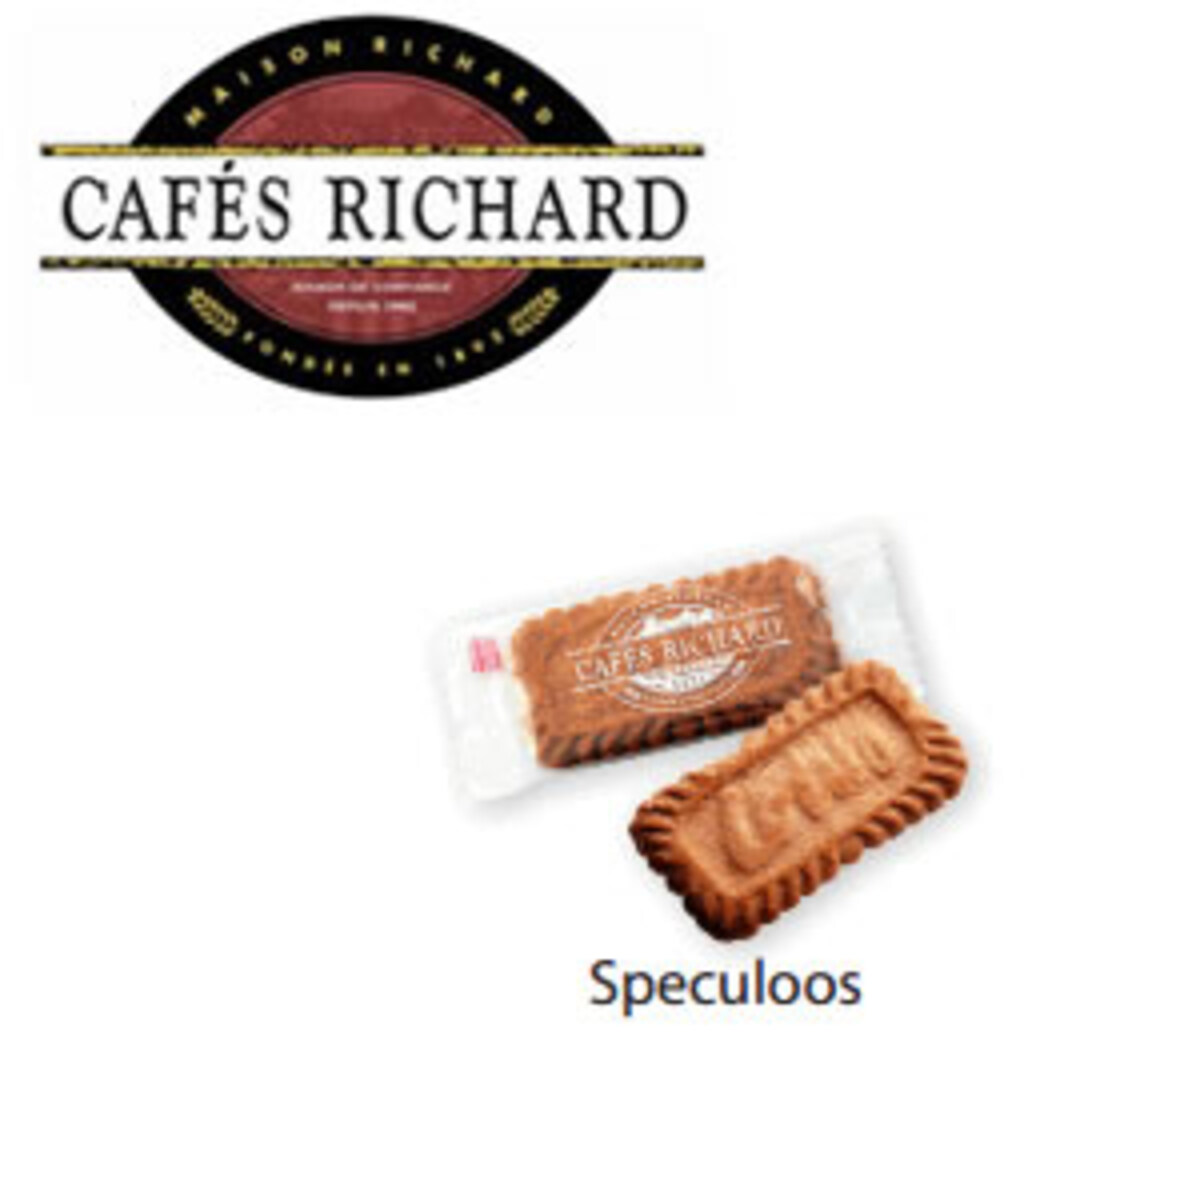 Cafés Richard Lotus Biscuits - 300бр бисквитки